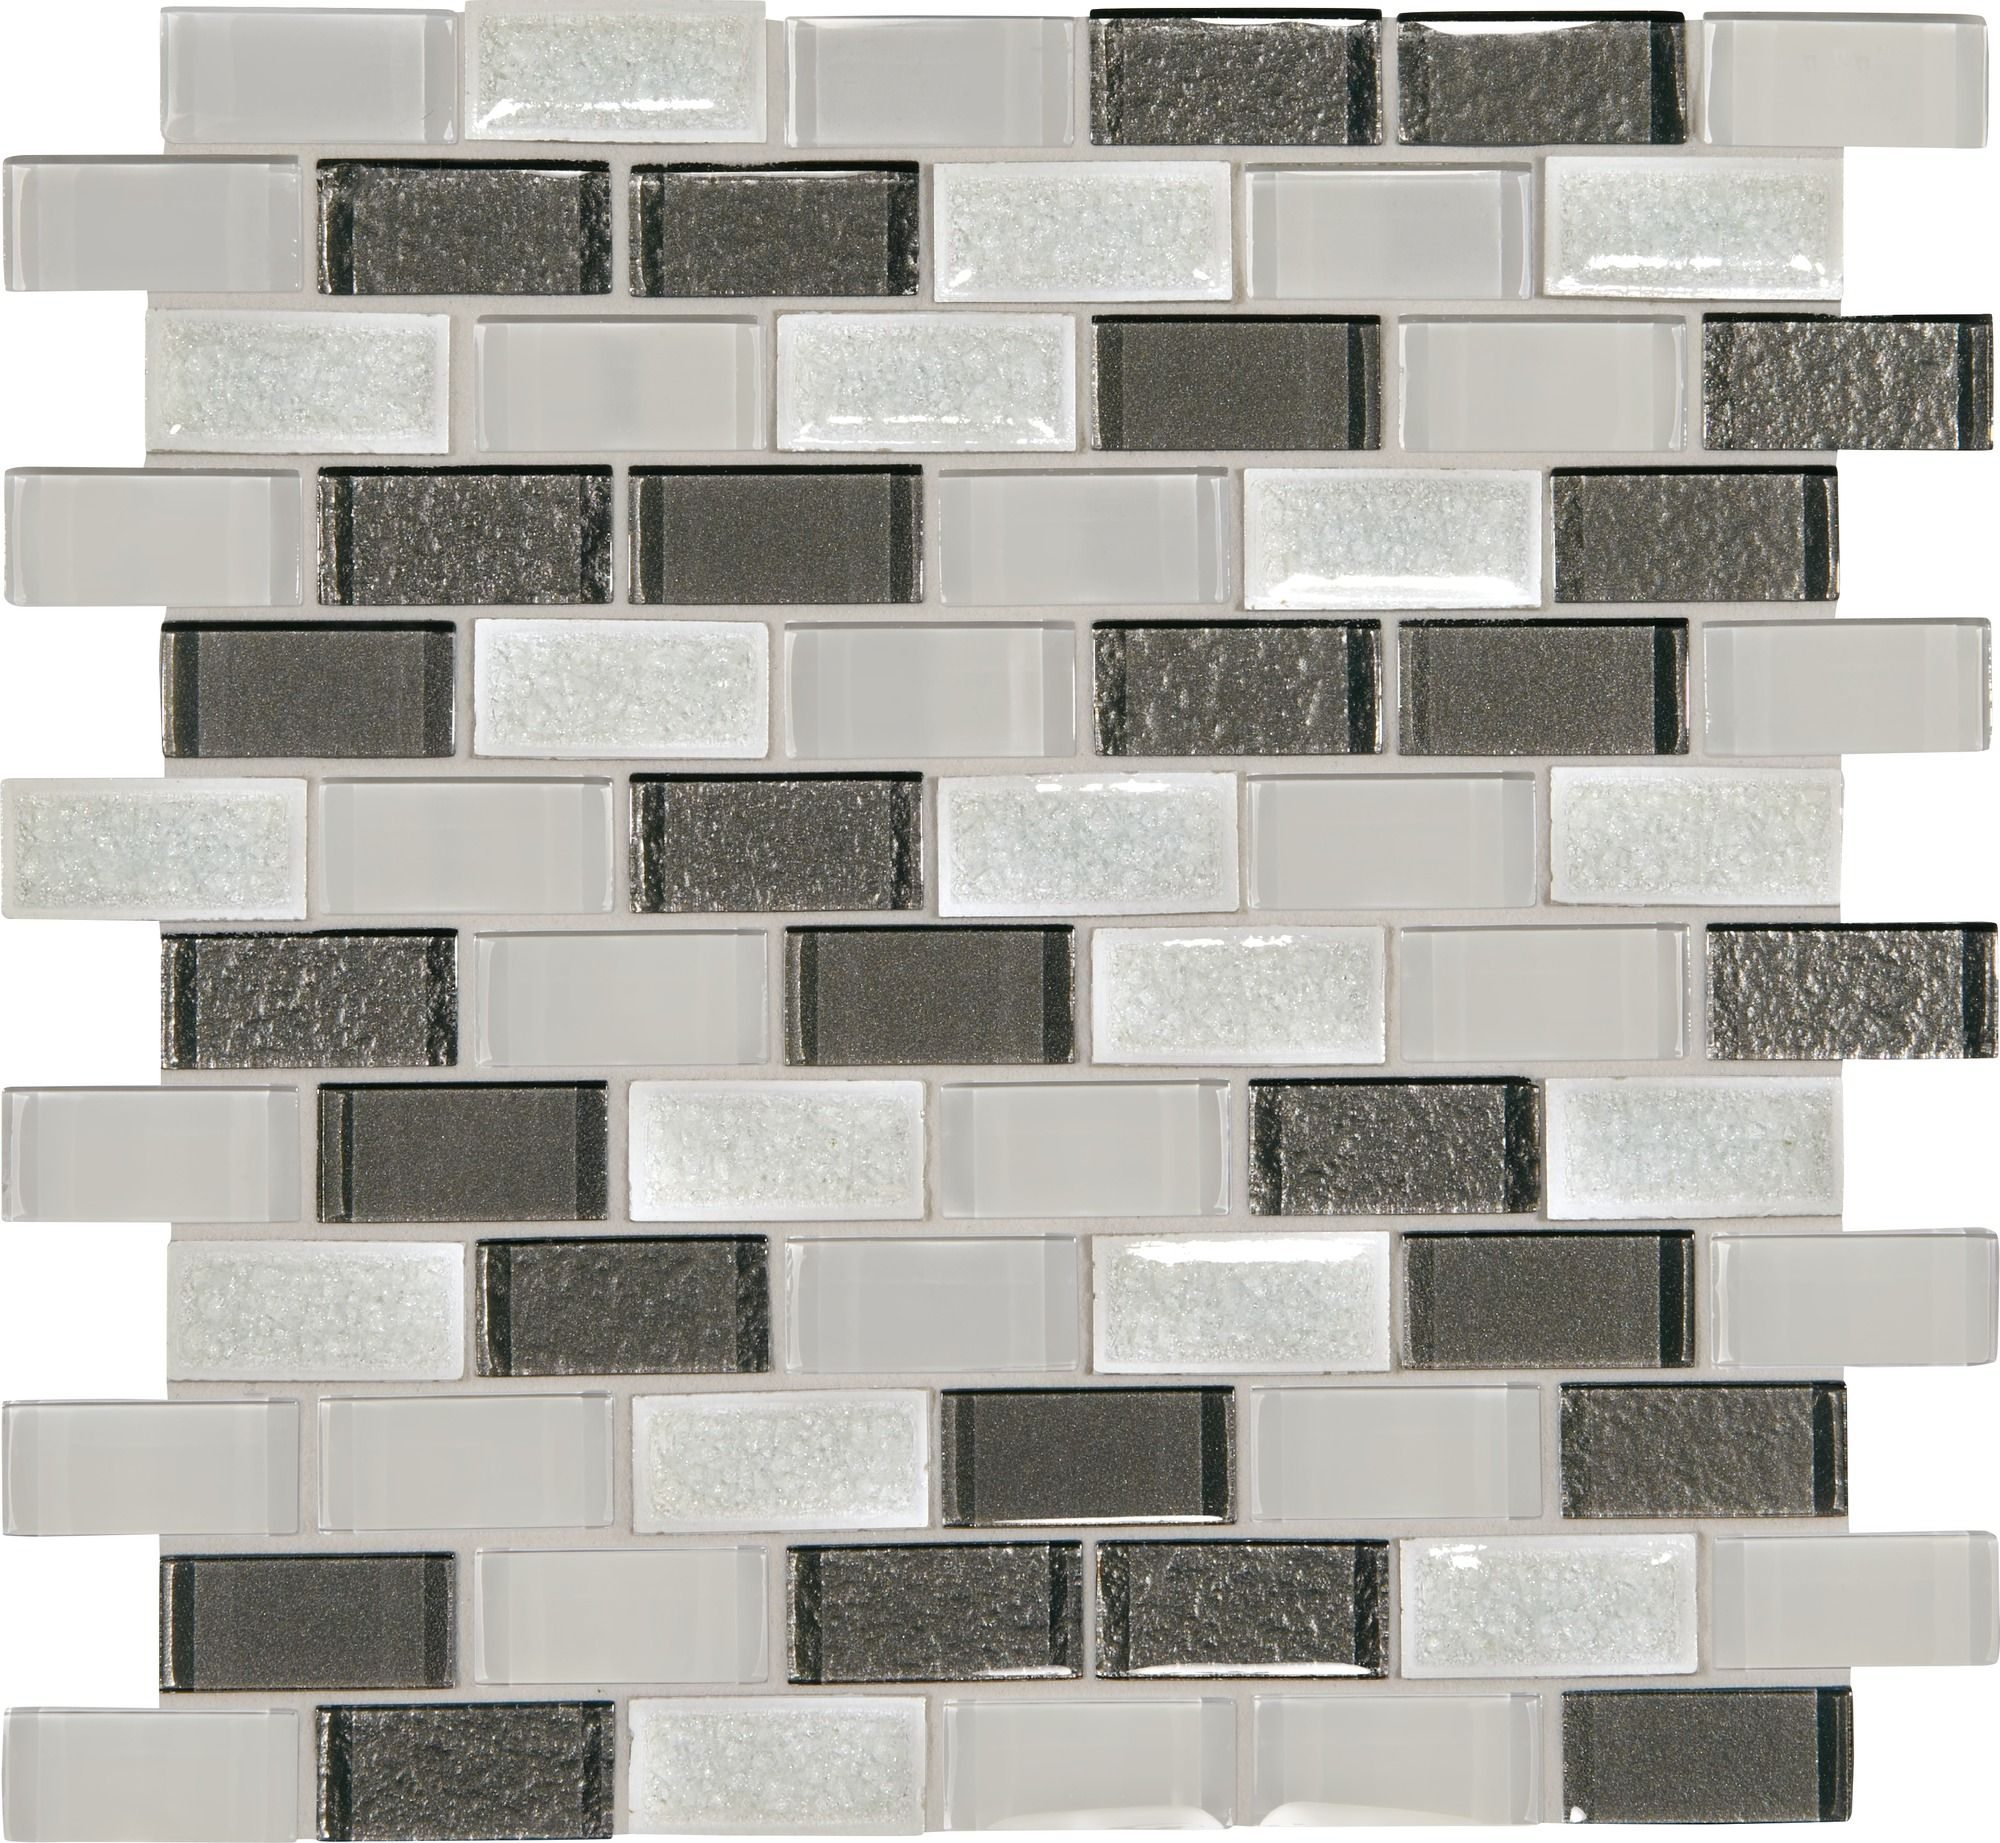 Crystal Shores Delta Diamond 12x13 Brick Joint Blended Mosaic